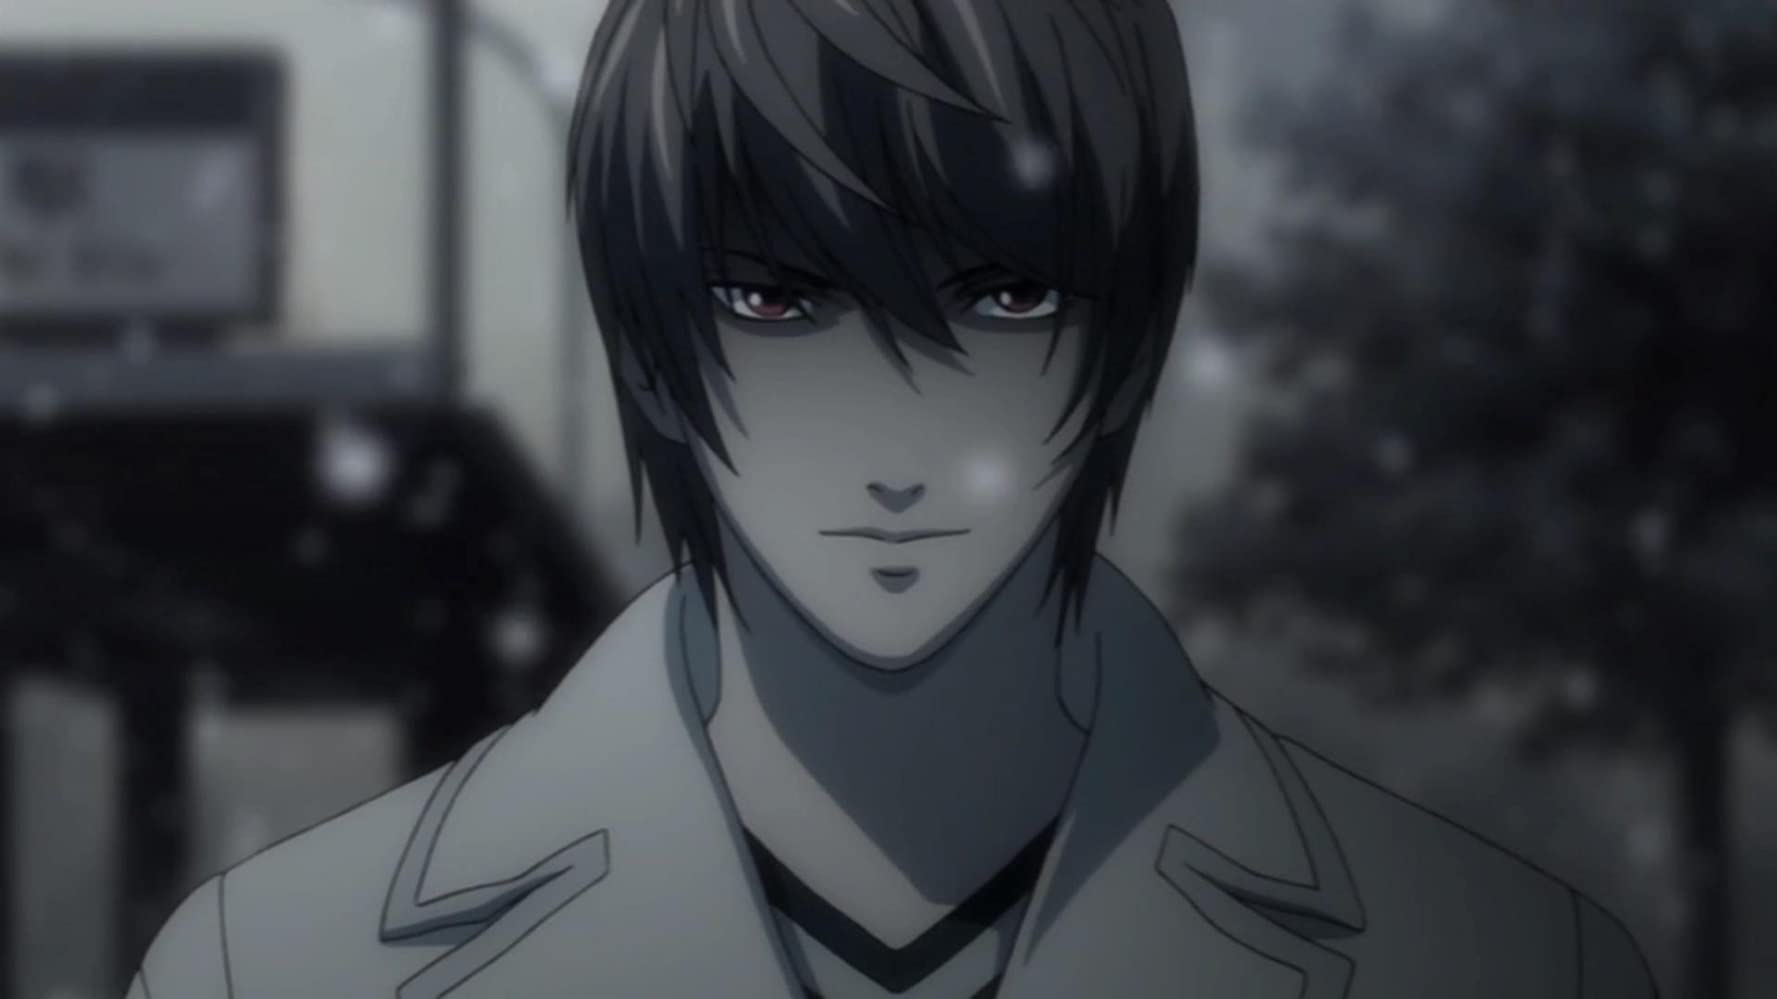 Carnetul morții - Death Note (2006) Online Subtitrat in Romana